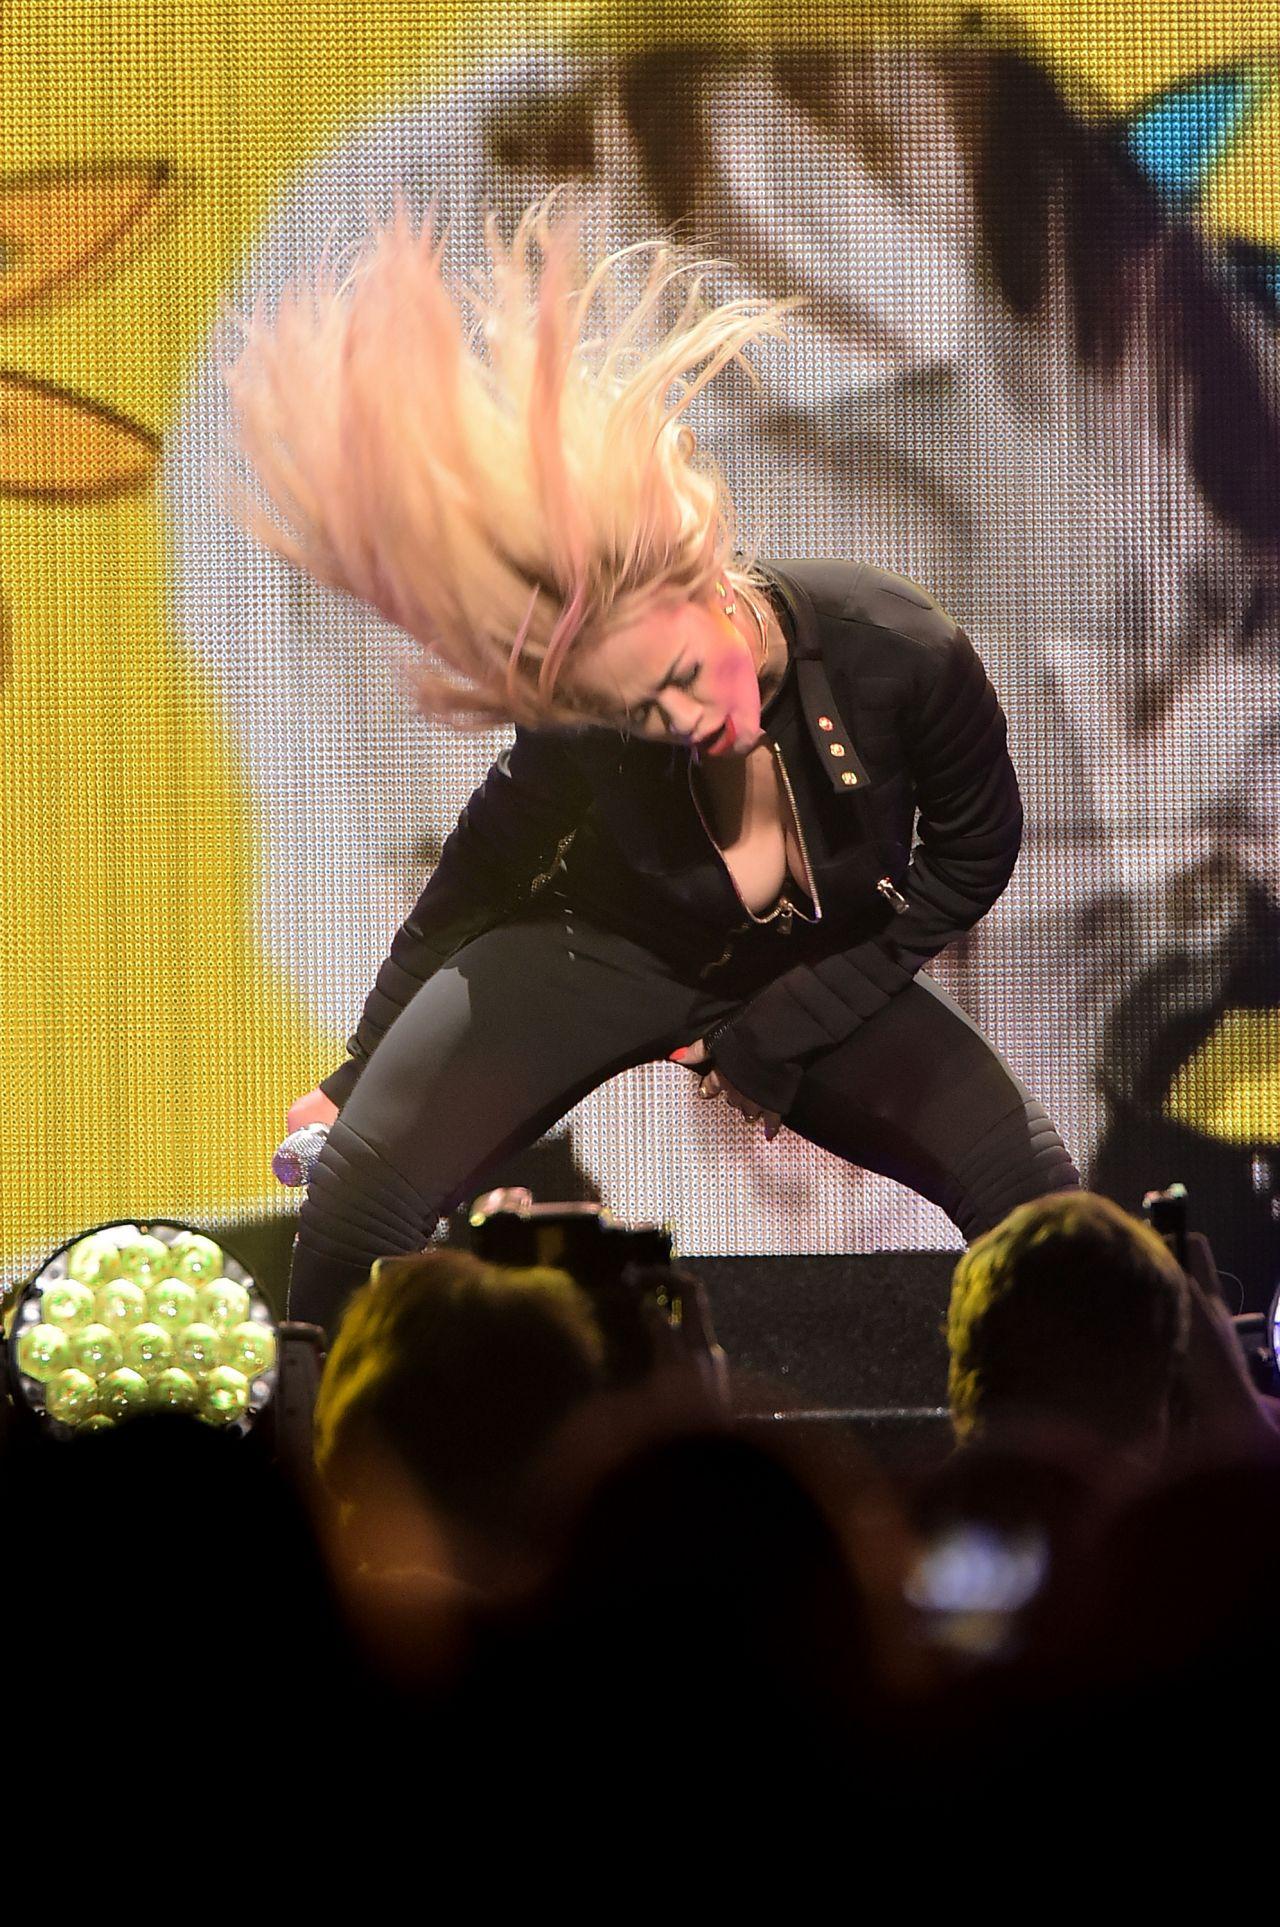 Rita Ora Performs at Q102